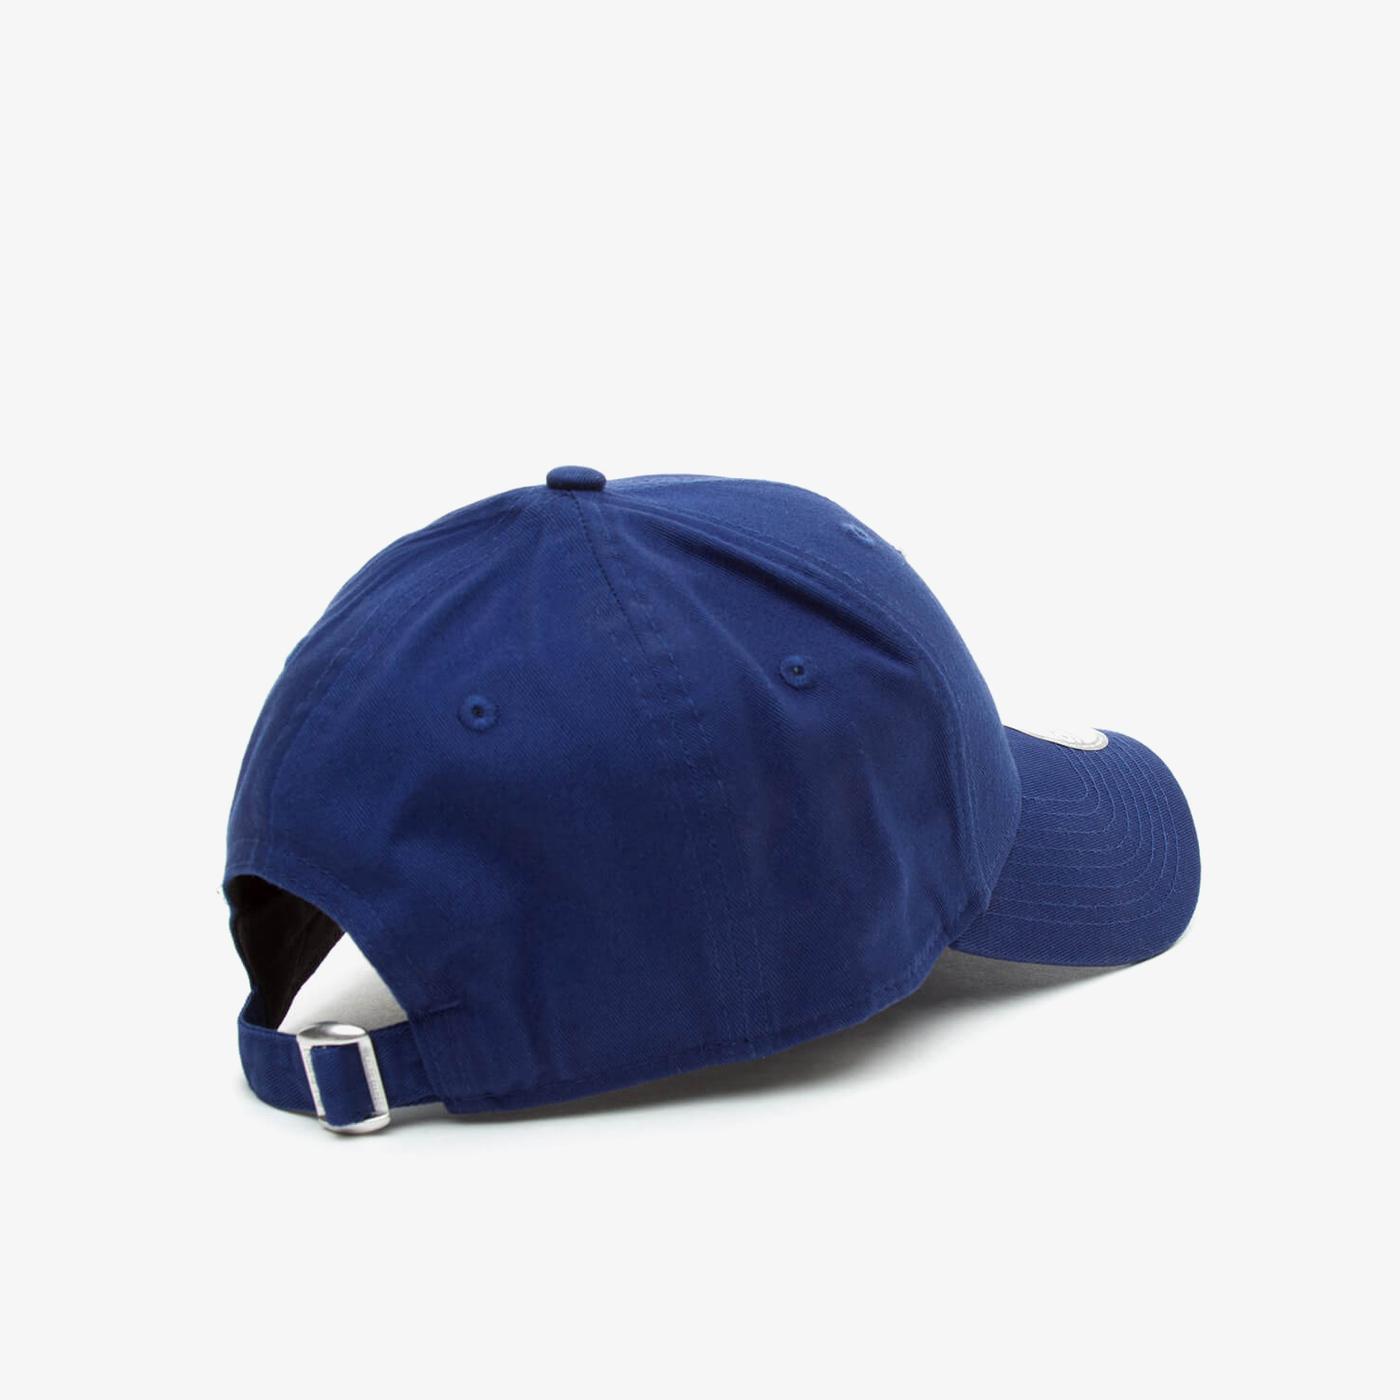 New Era Los Angeles Dodgers Unisex Lacivert Şapka